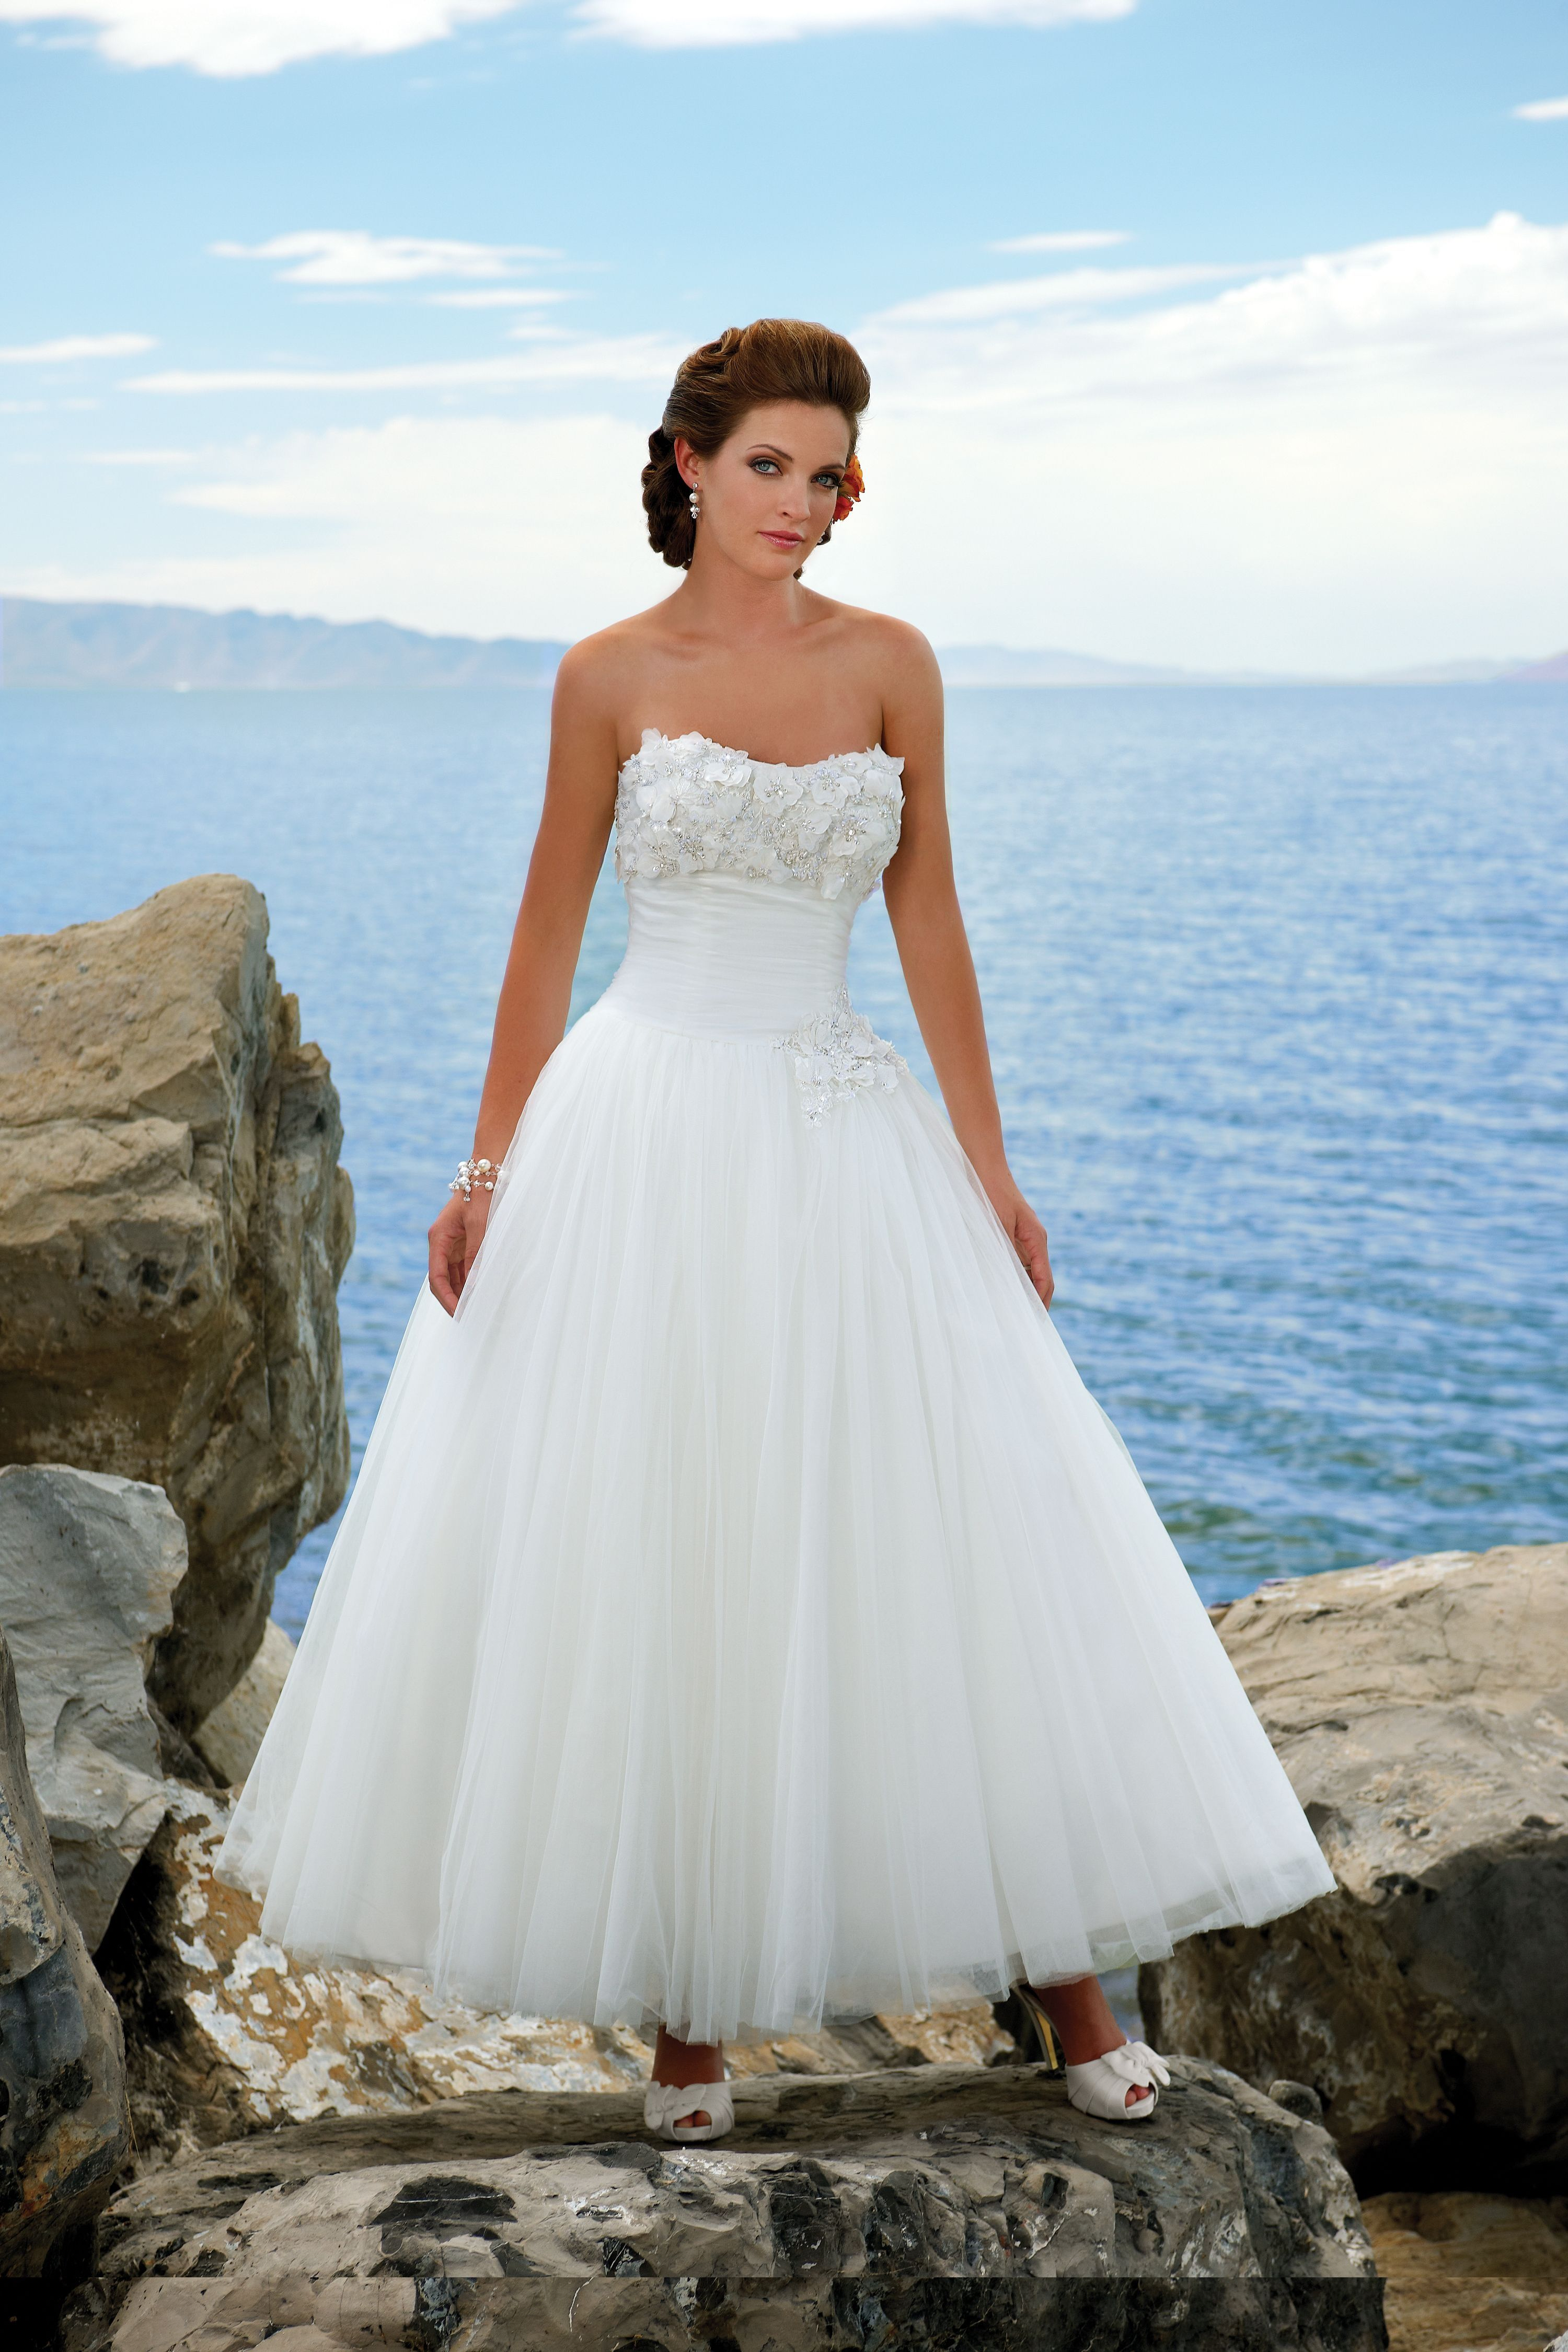 Vintage Aline Sweetheart Anklelength Ruffles Beach Wedding Dresses